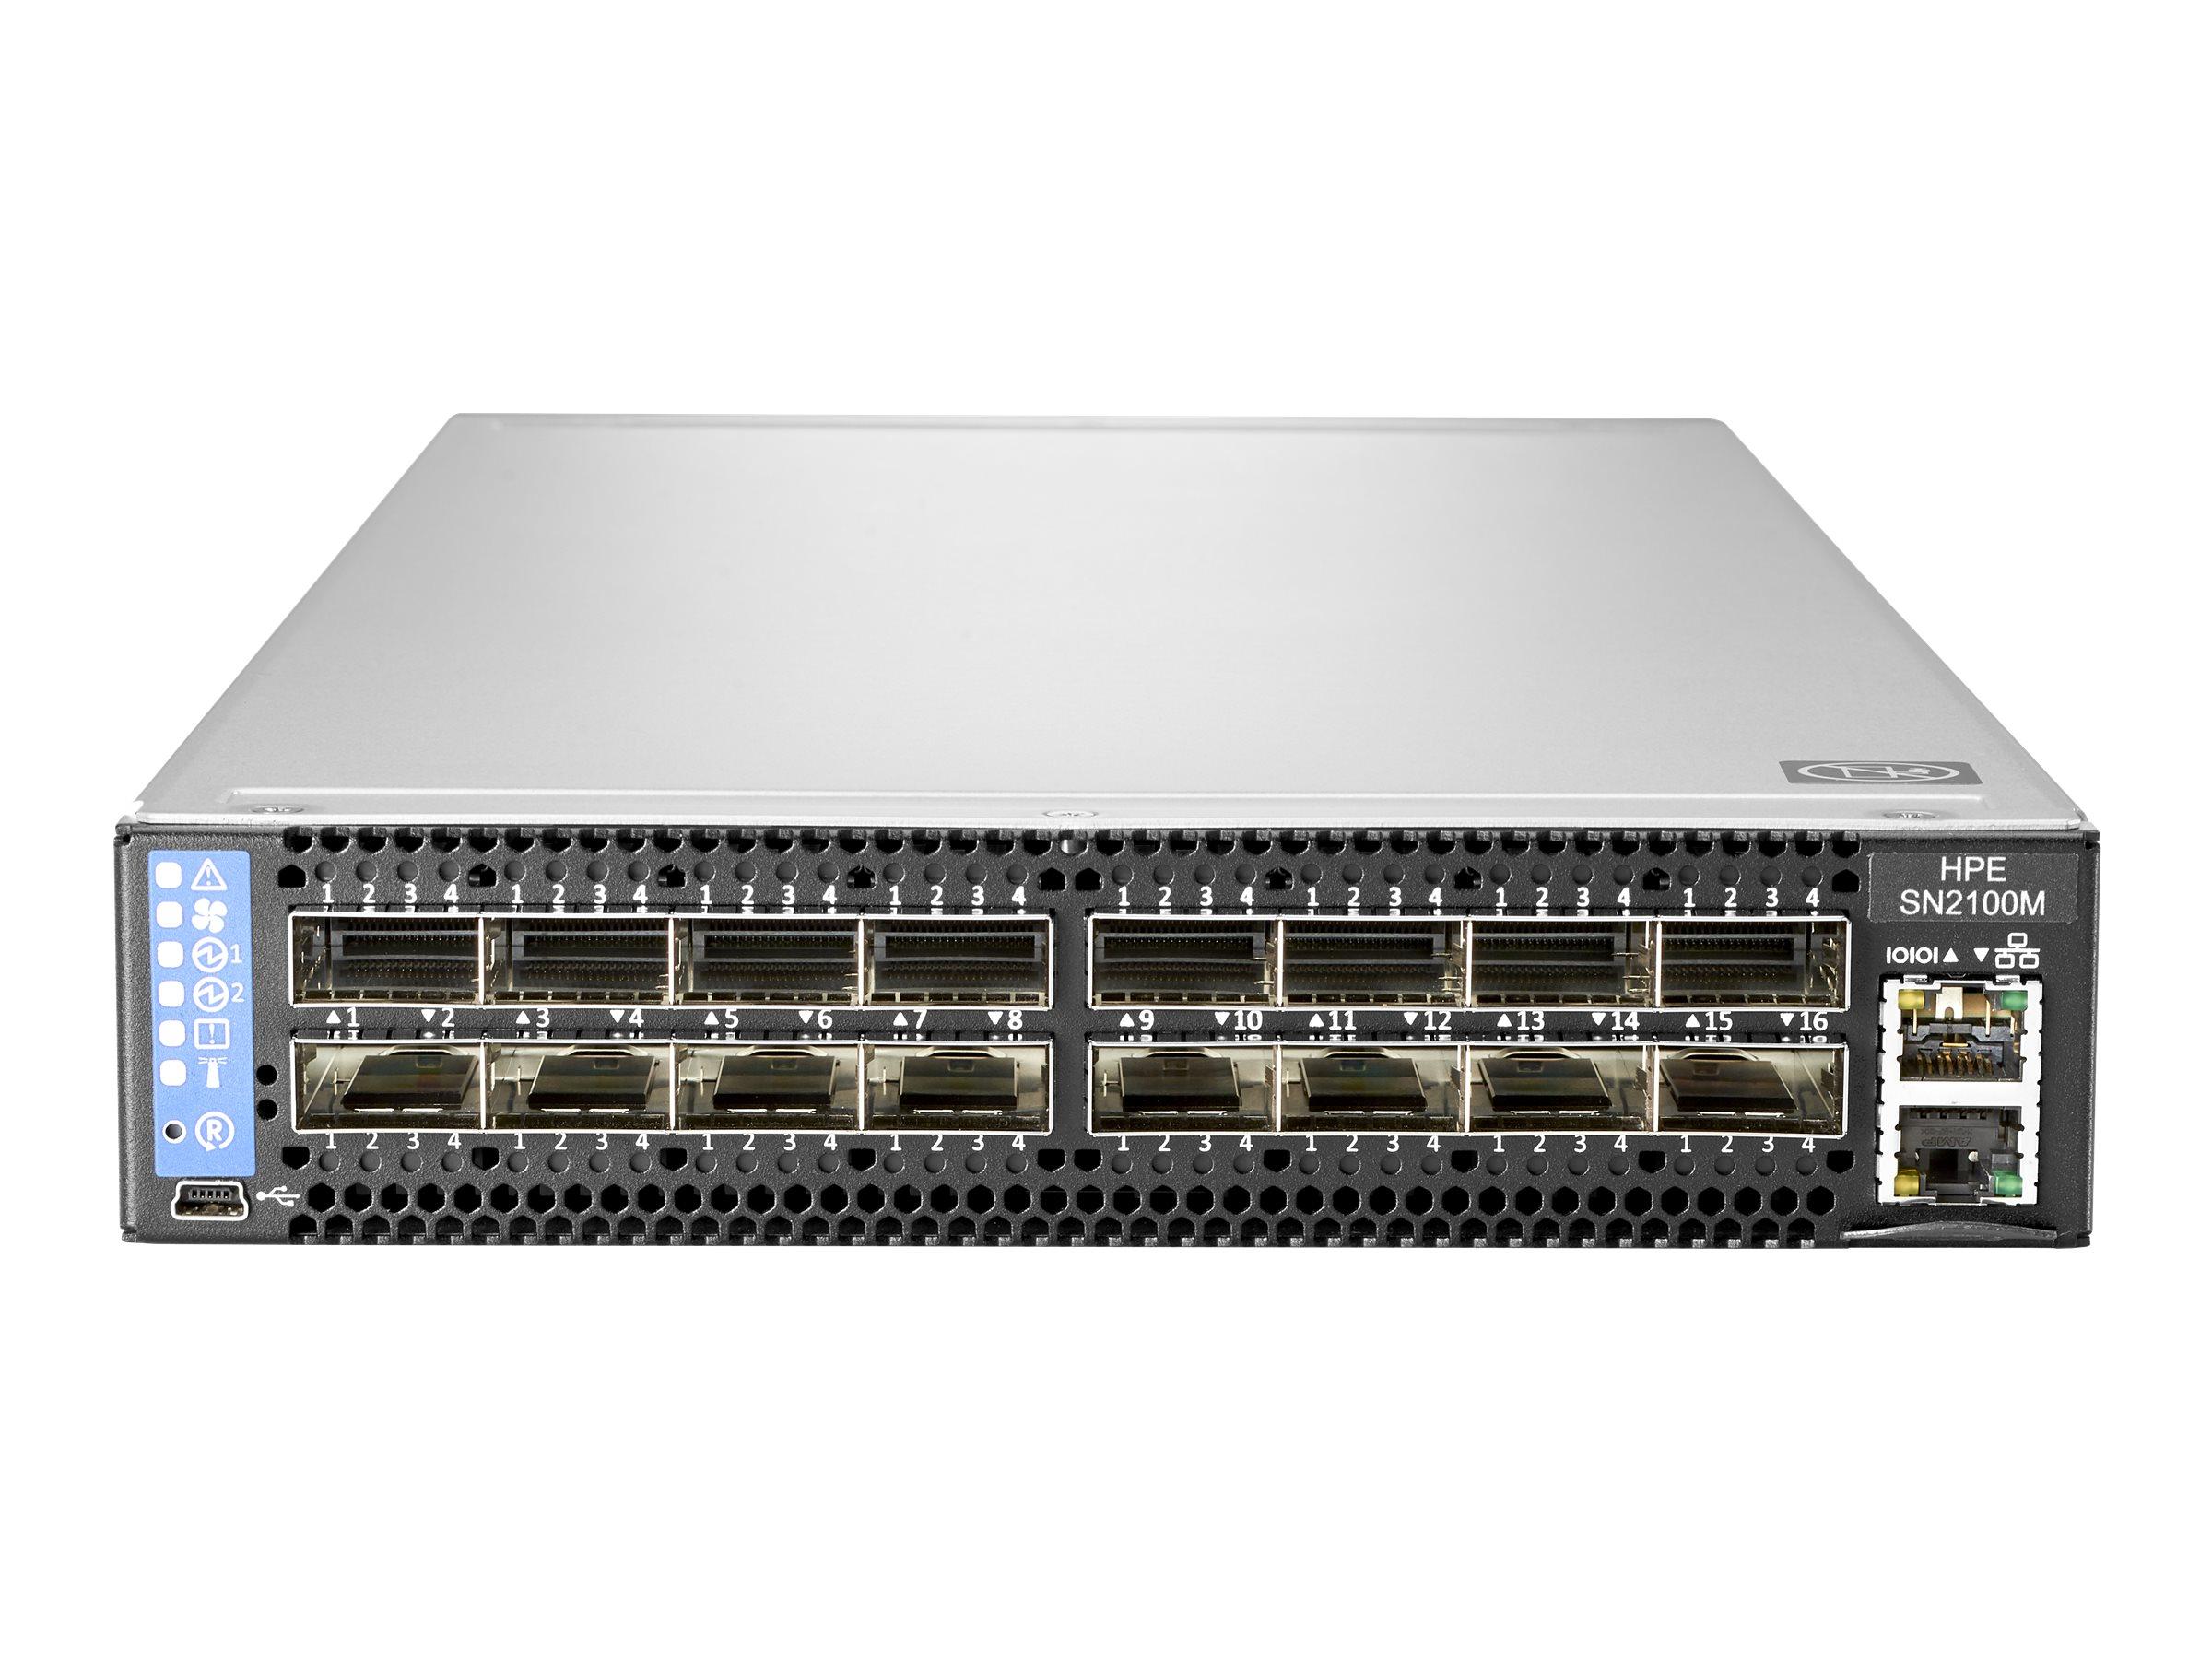 HPE SN2100M 100GbE 16QSFP28 Switch - Switch - L3 - managed - 16 x 100 Gigabit QSFP28 - an Rack montierbar